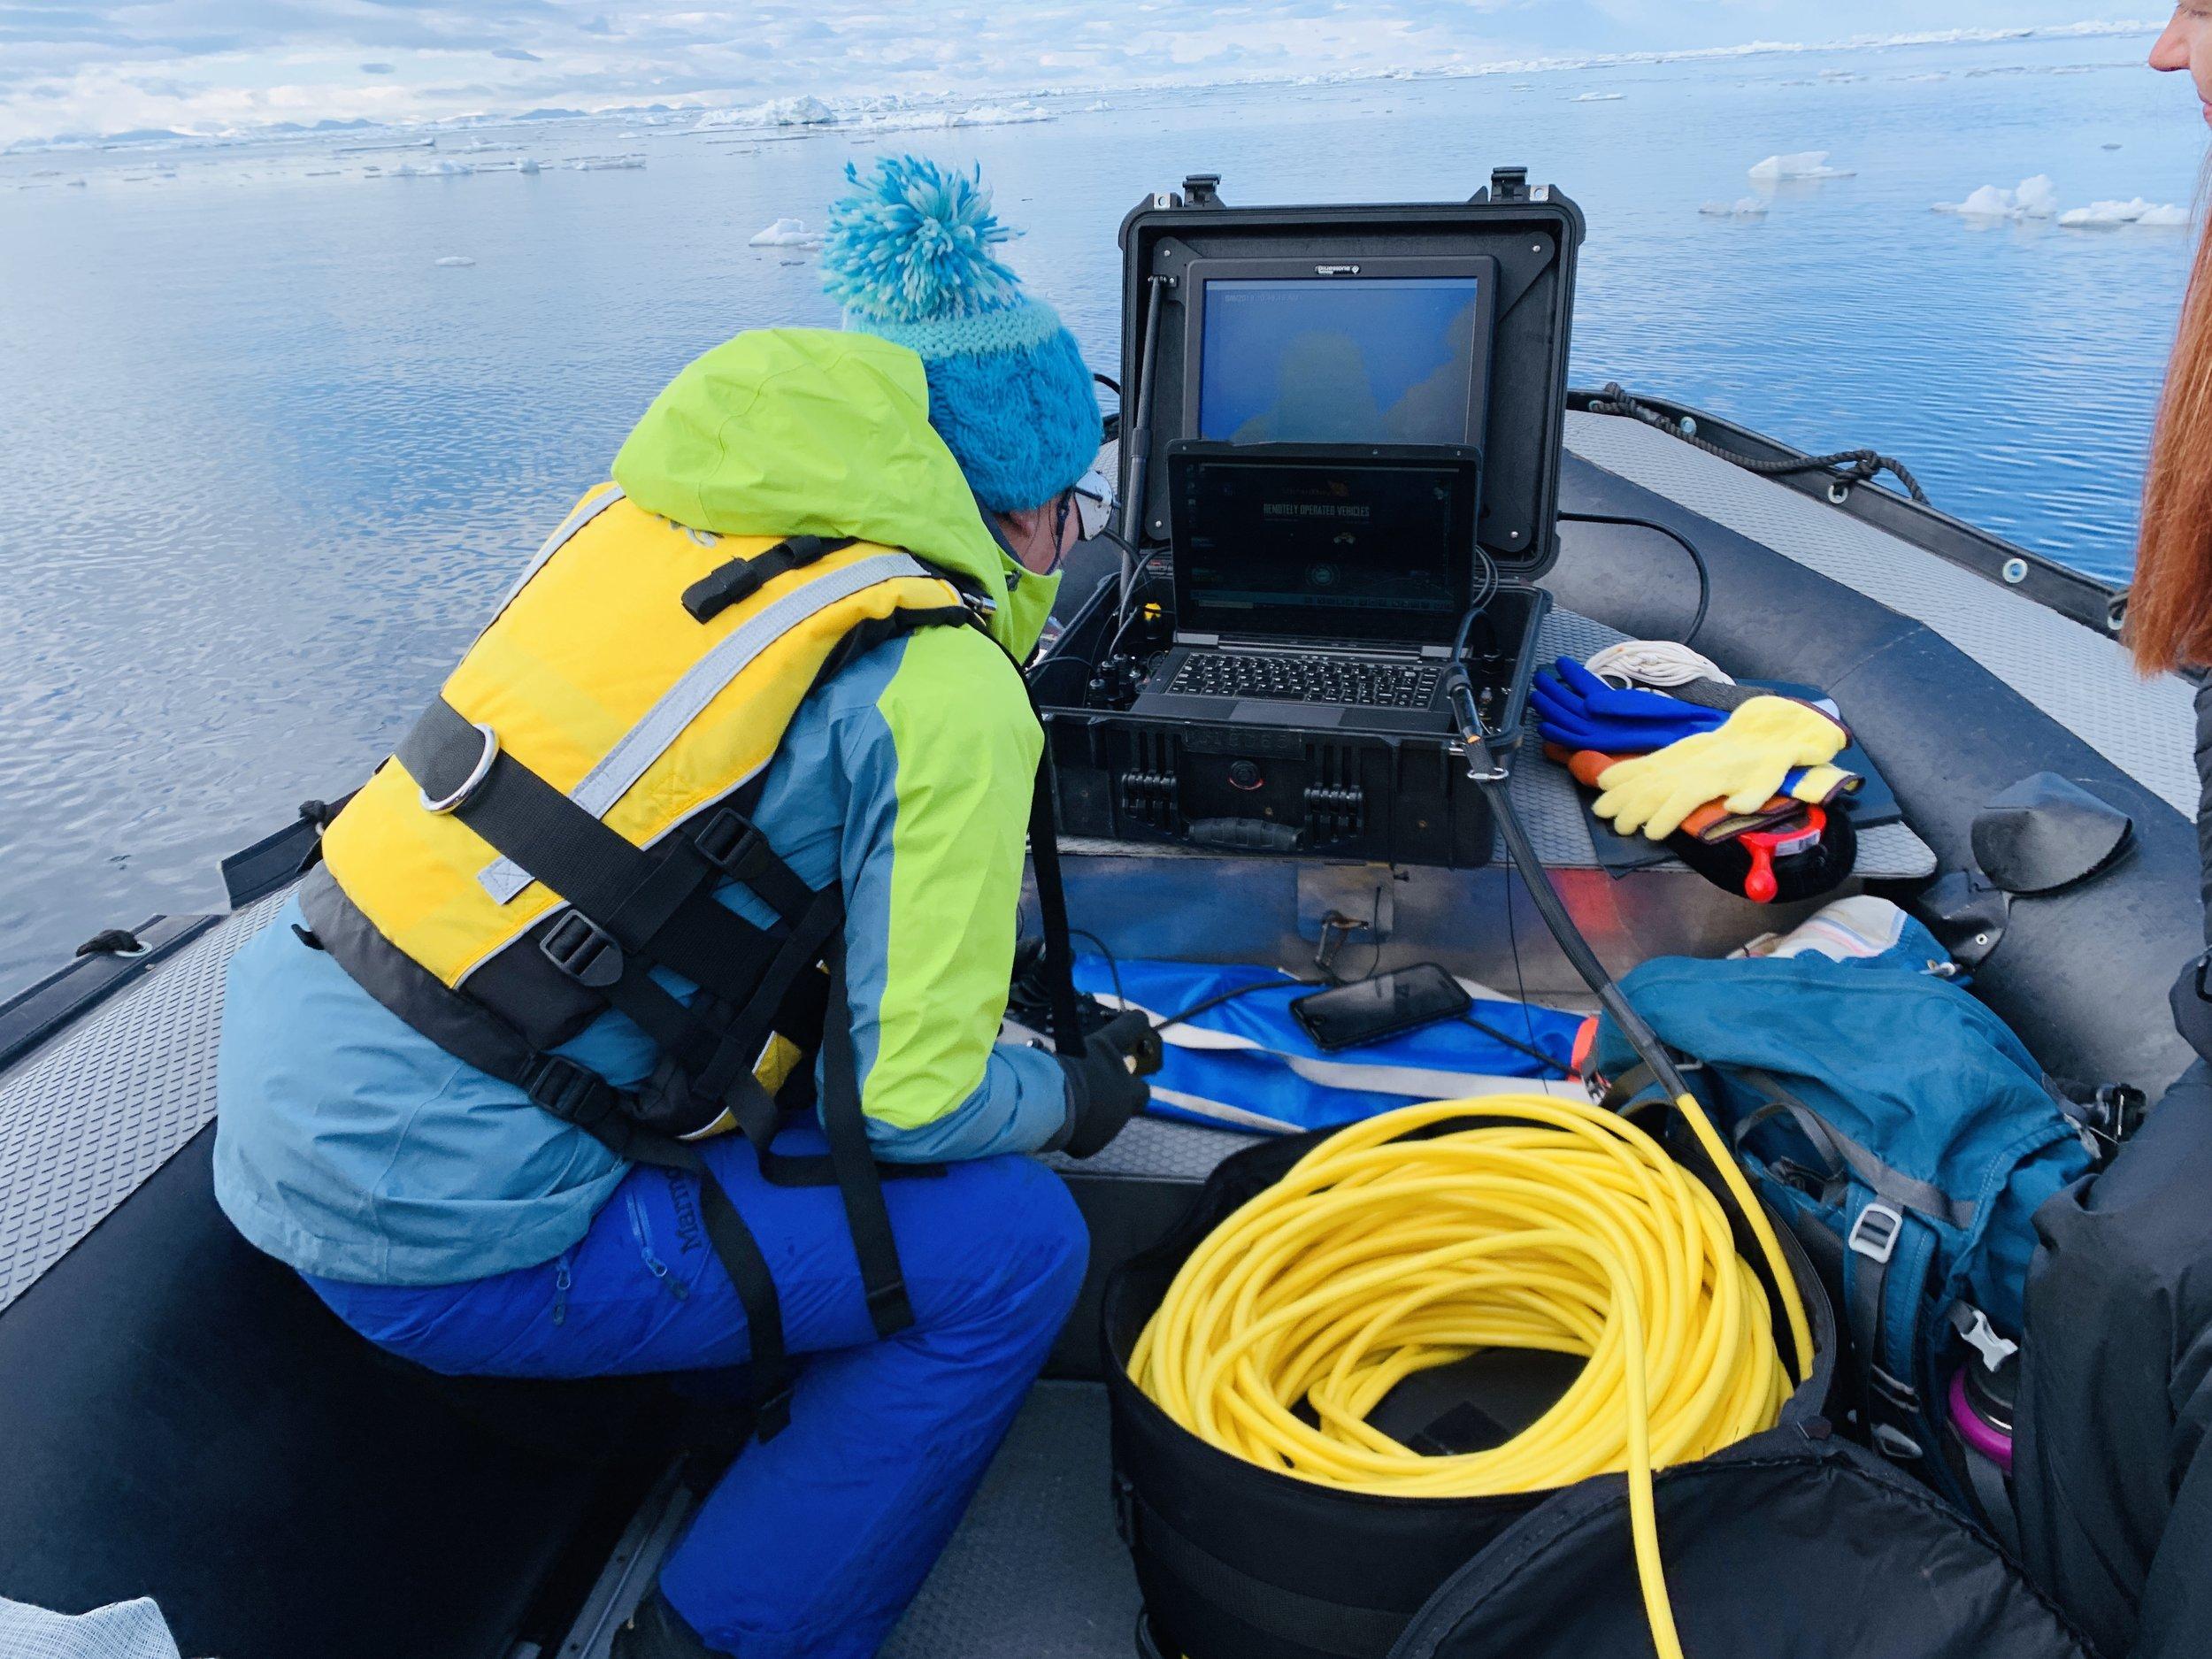 Warmouth_Underwater ROV camera on zodiac.jpg